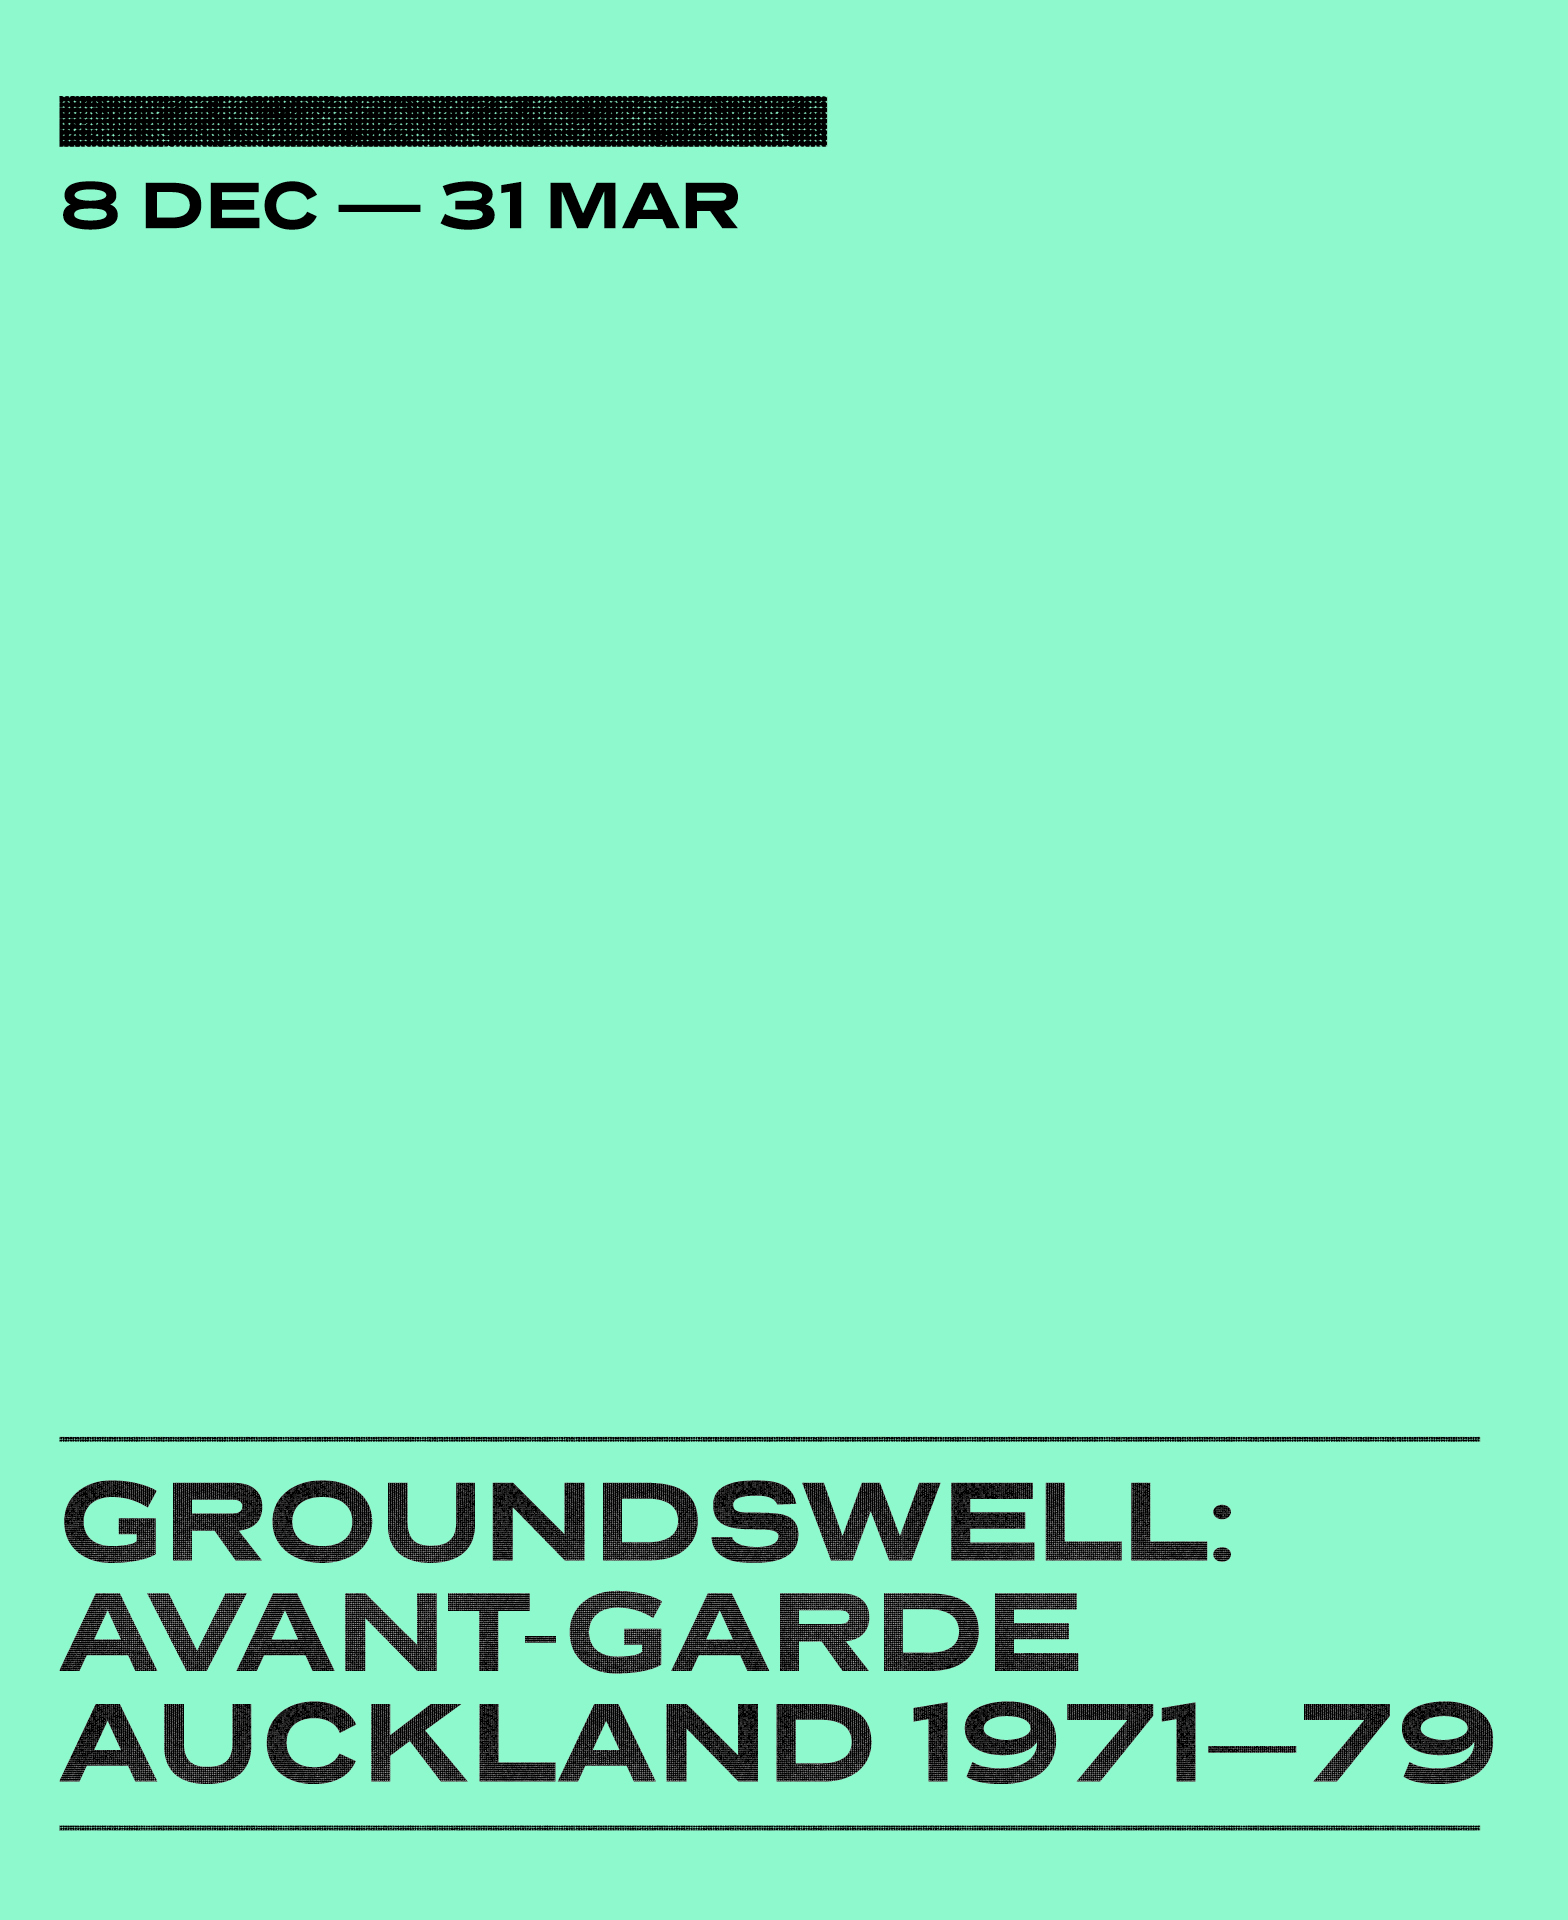 groundswell-mobile.jpg